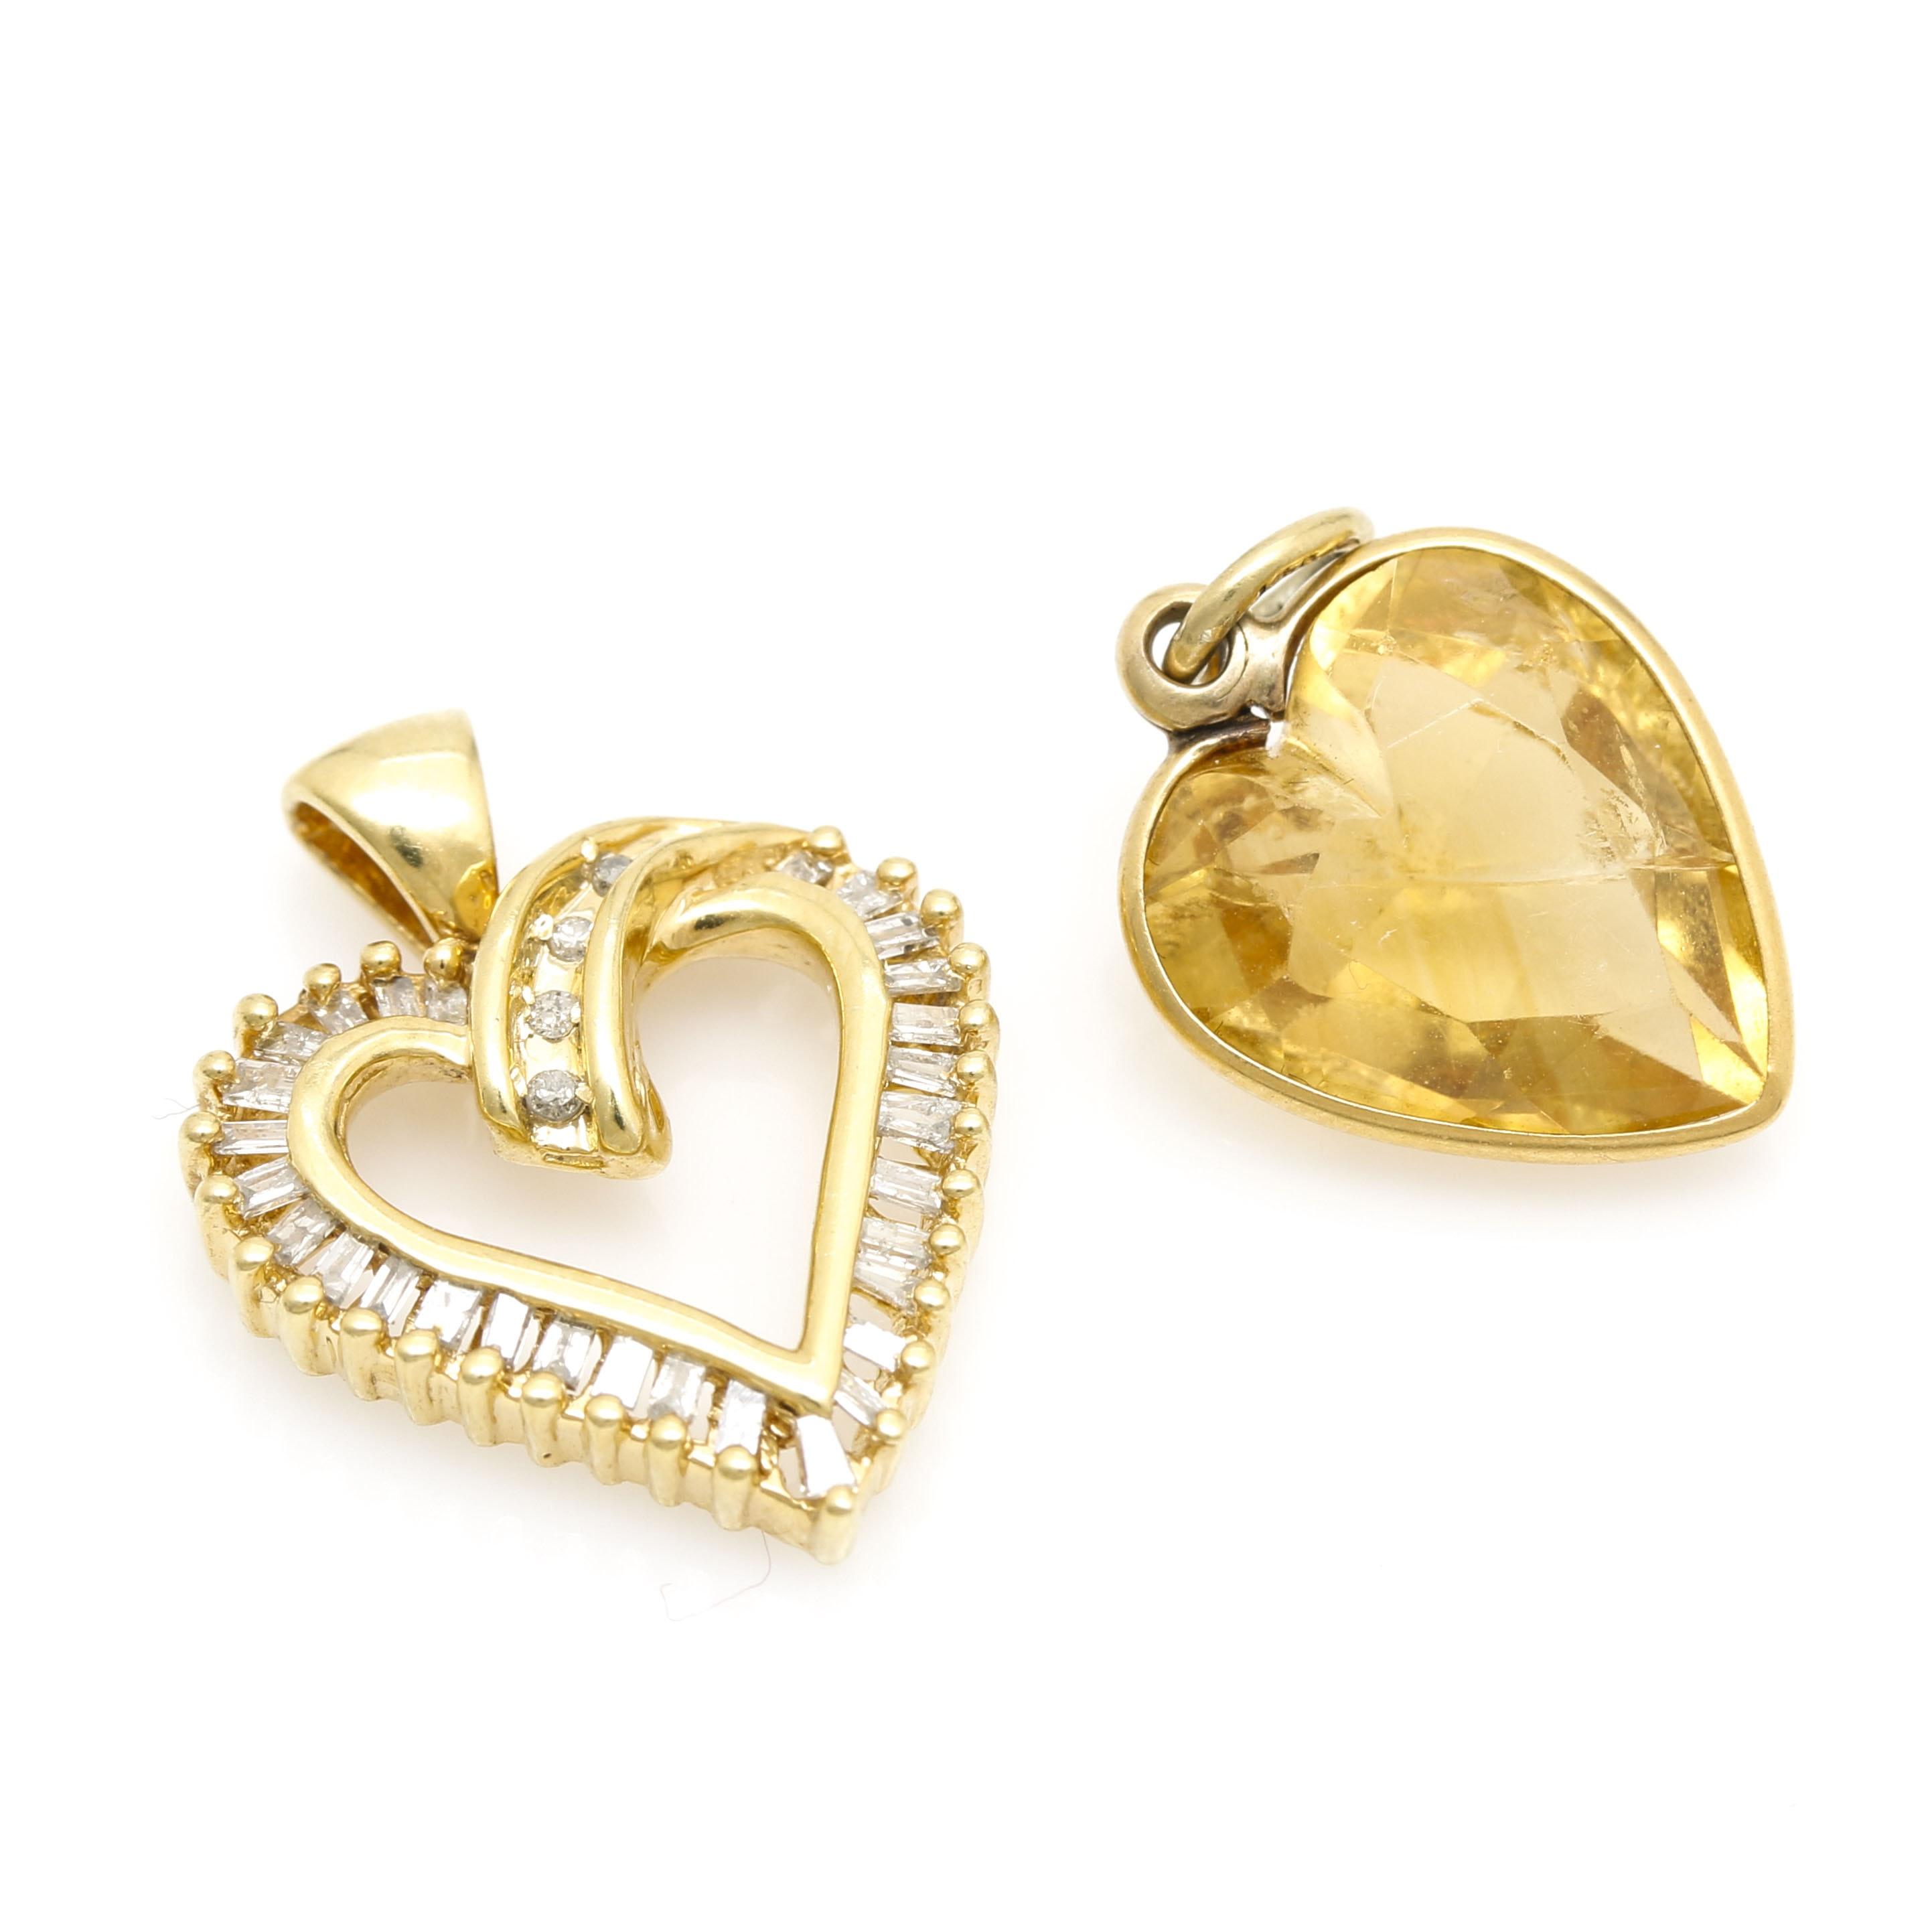 10K Yellow Gold Citrine and Diamond Heart Pendant Assortment